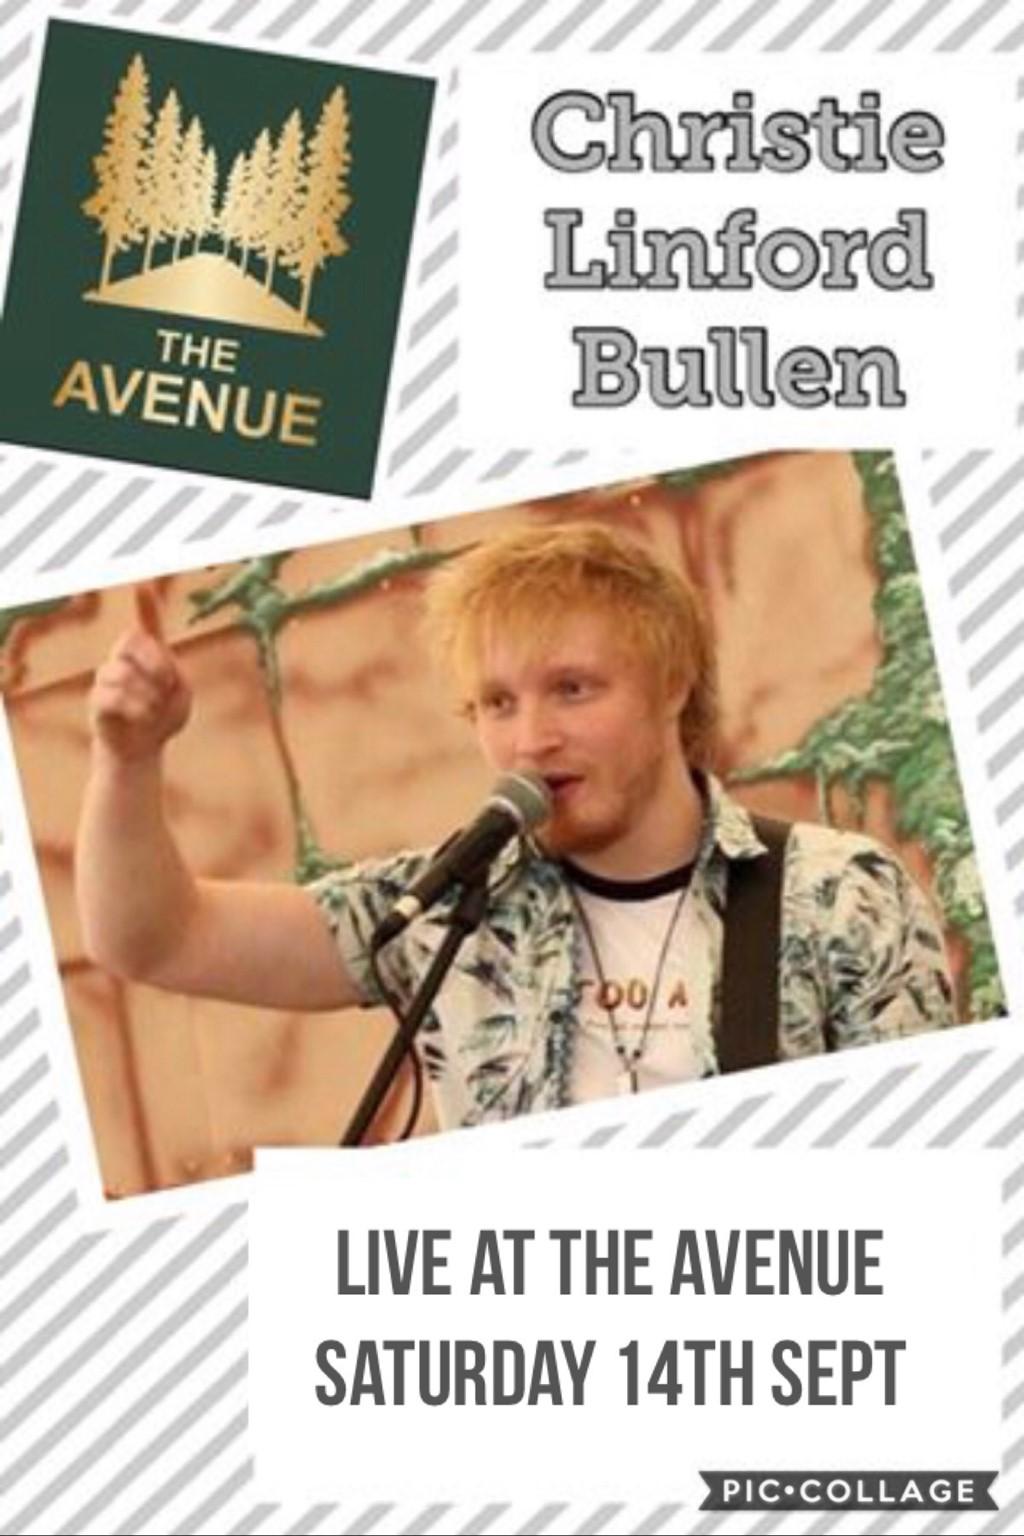 Christy Linford Bullen - Ed Sheeran Tribute